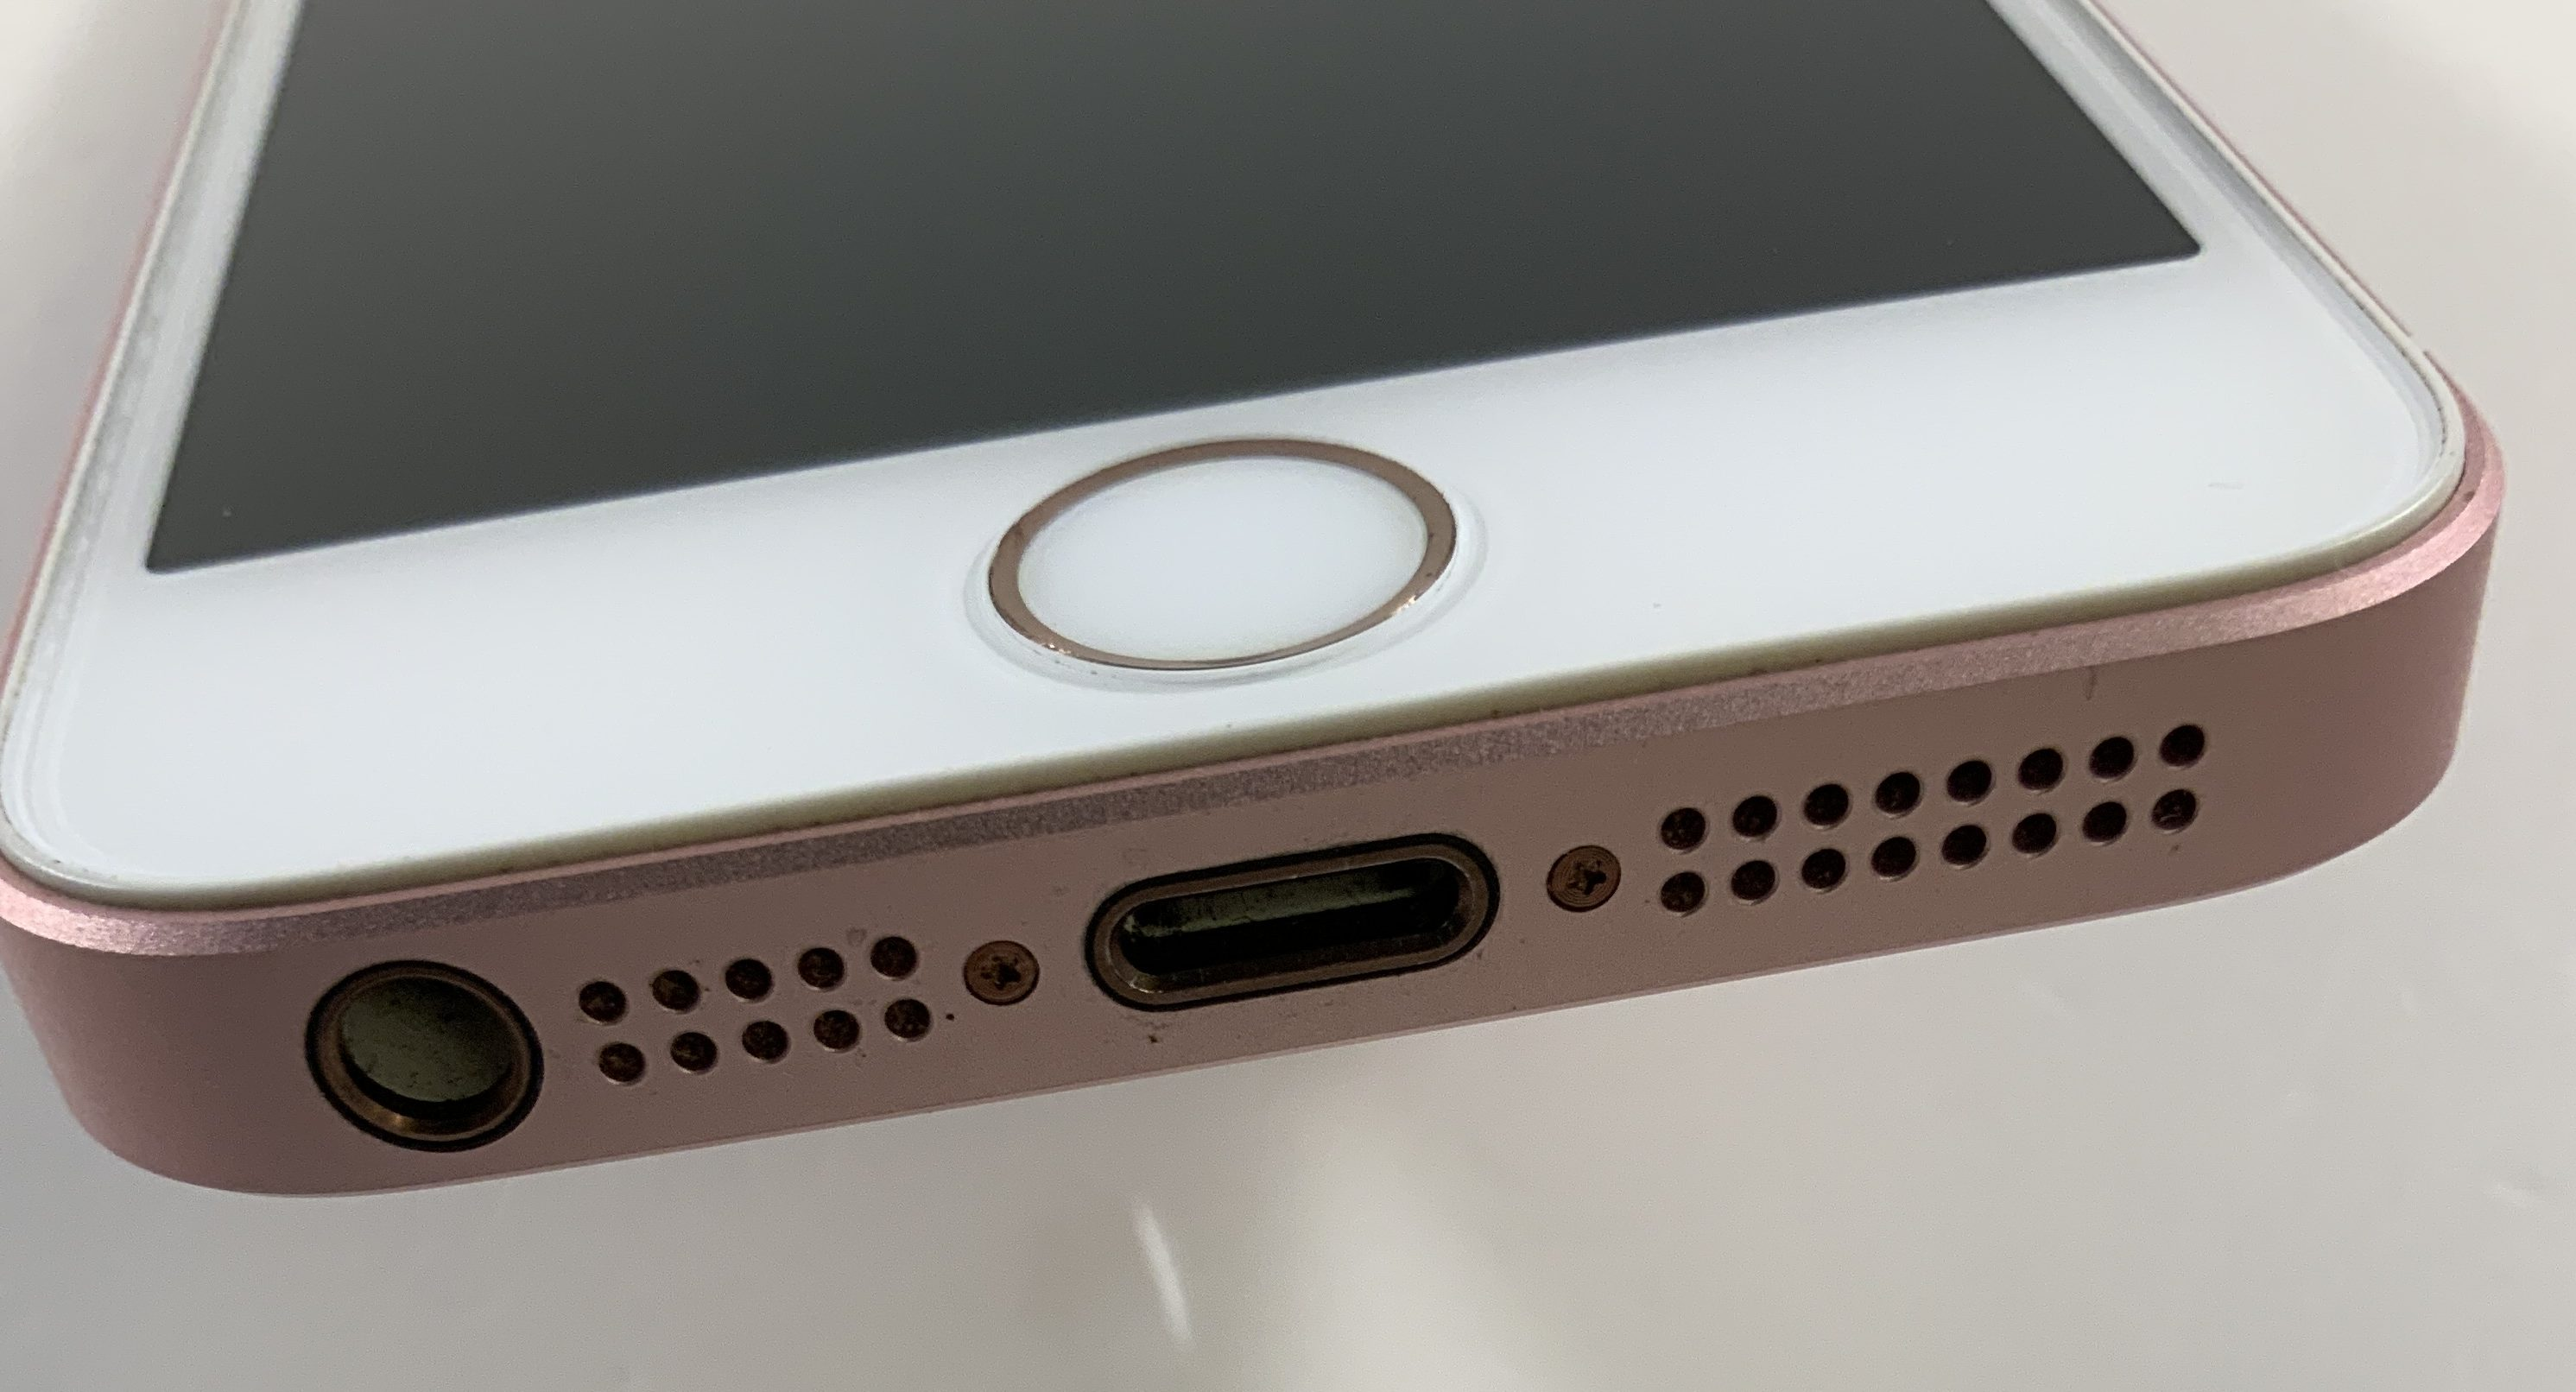 iPhone SE 32GB, 32GB, Rose Gold, image 3